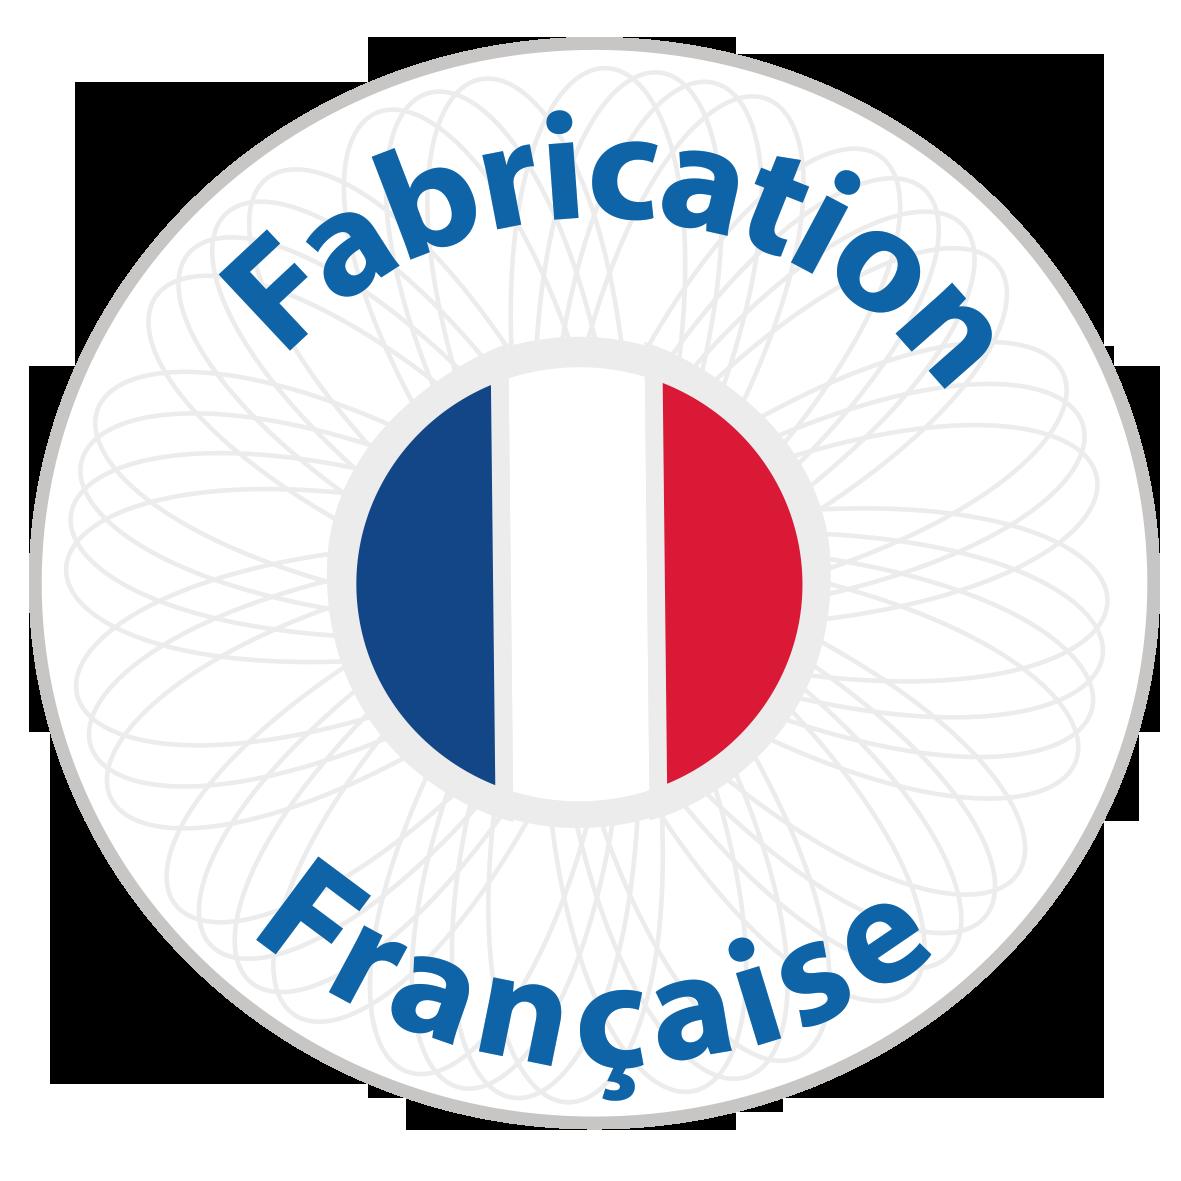 FABRICATION FRANCAISE fondblanc